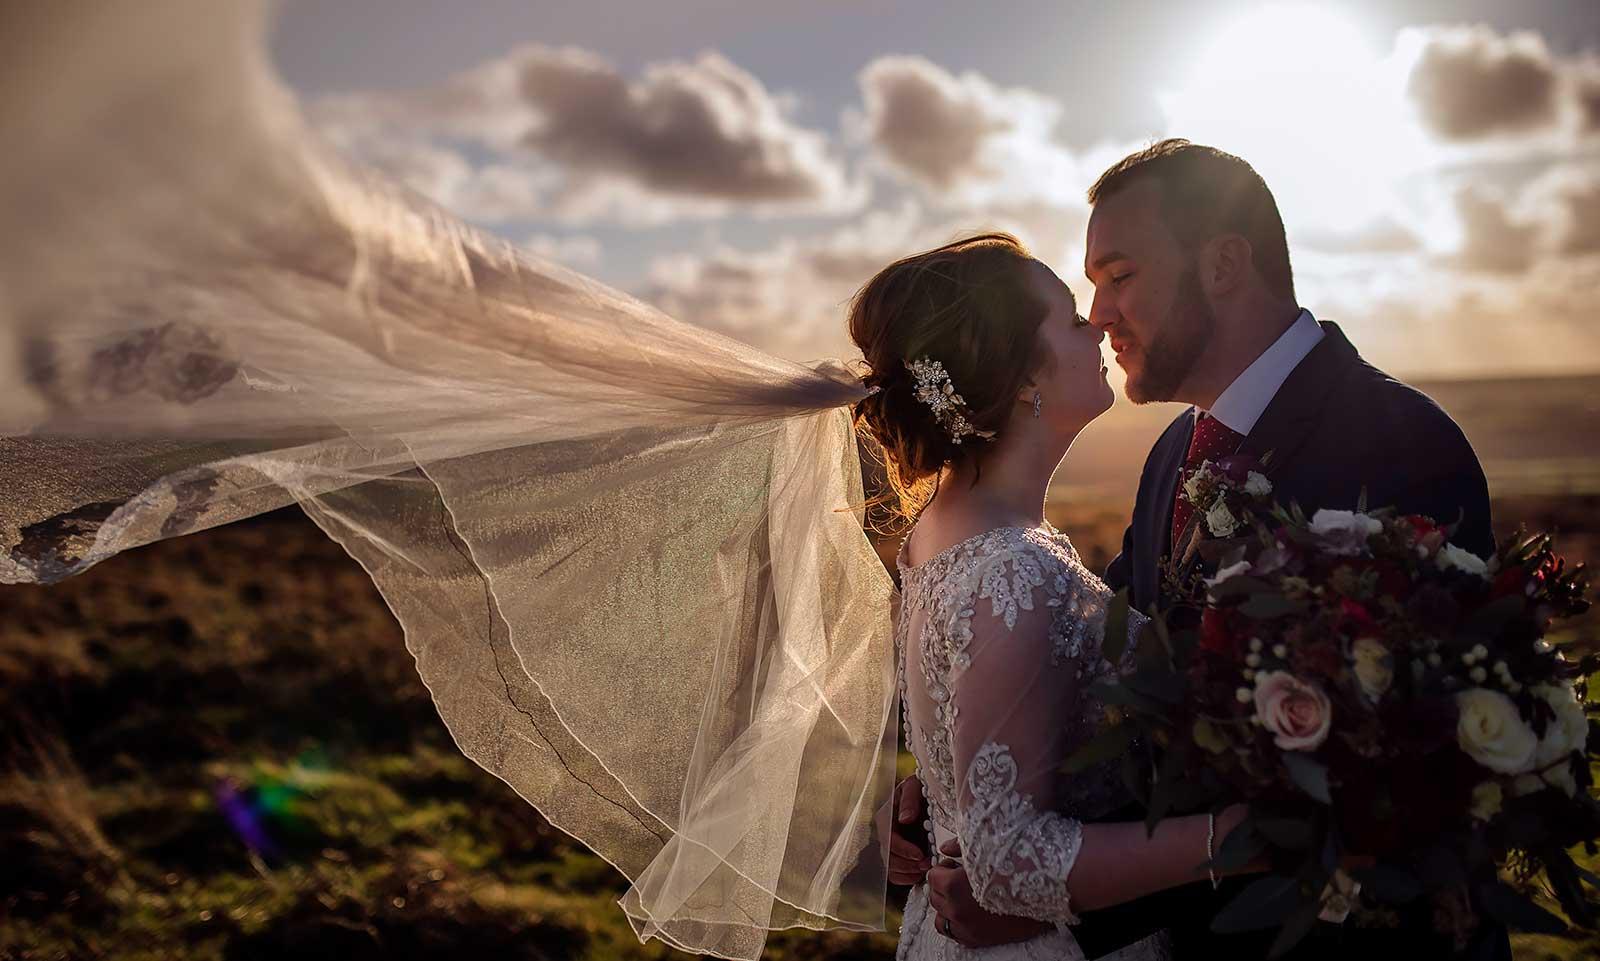 photographers perspective on post-wedding blues